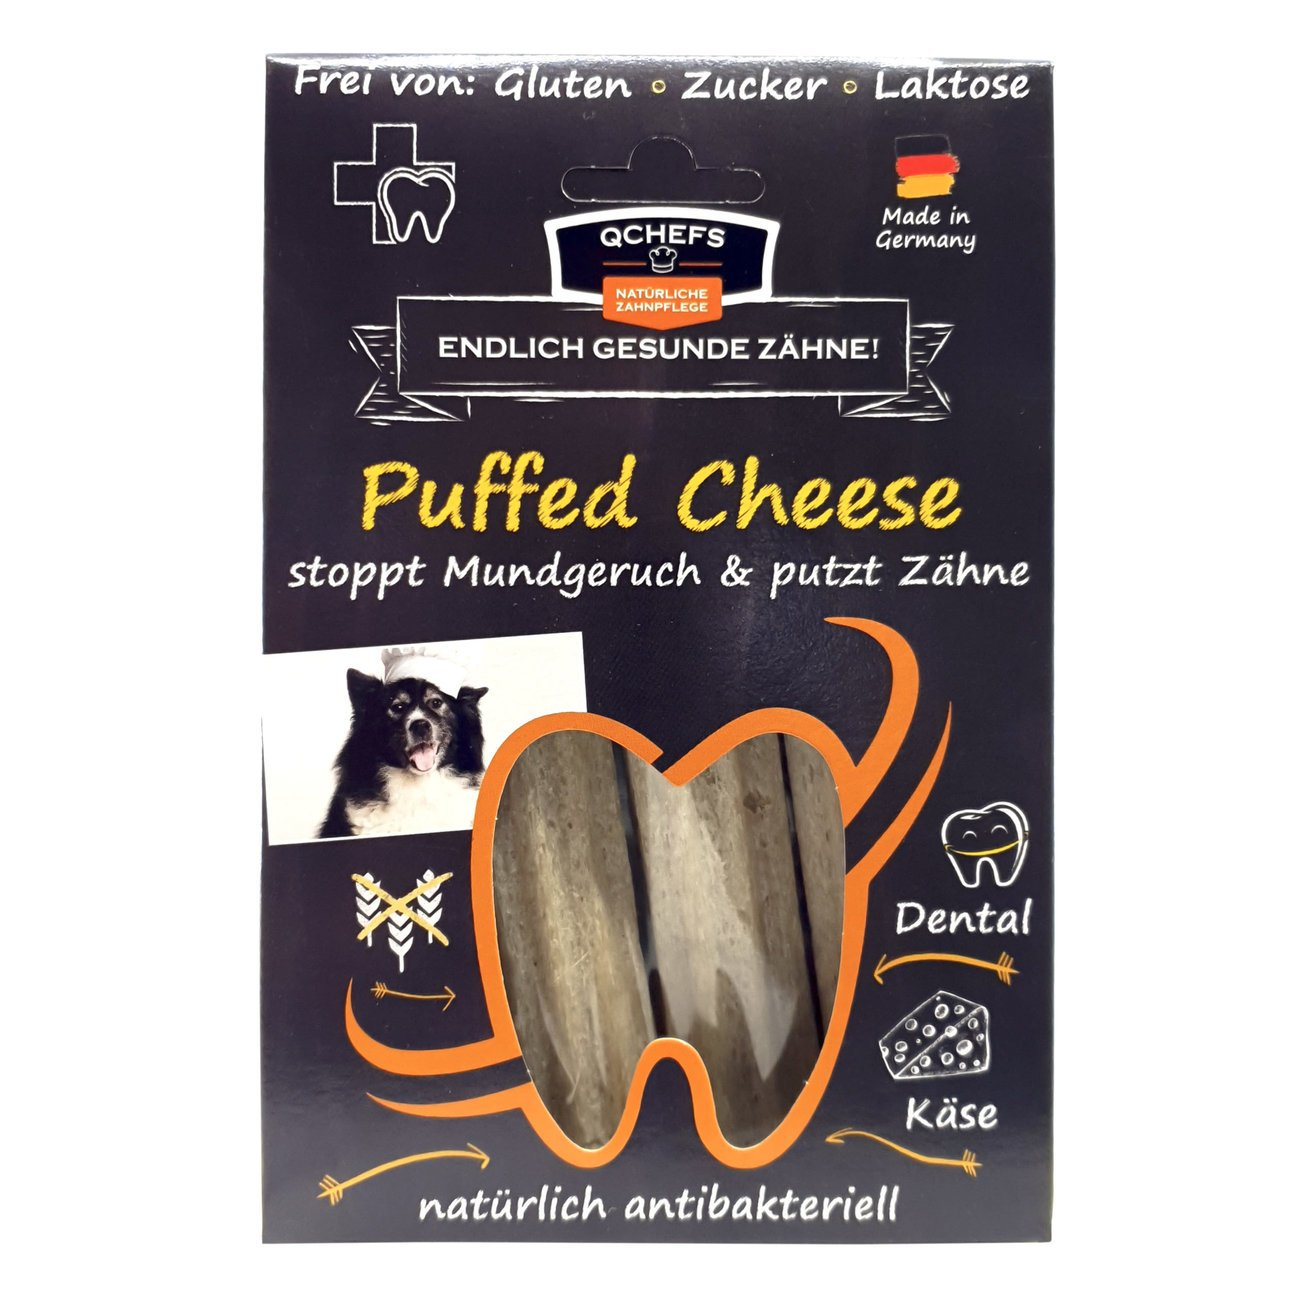 Qchefs Kauknochen Puffed Cheese